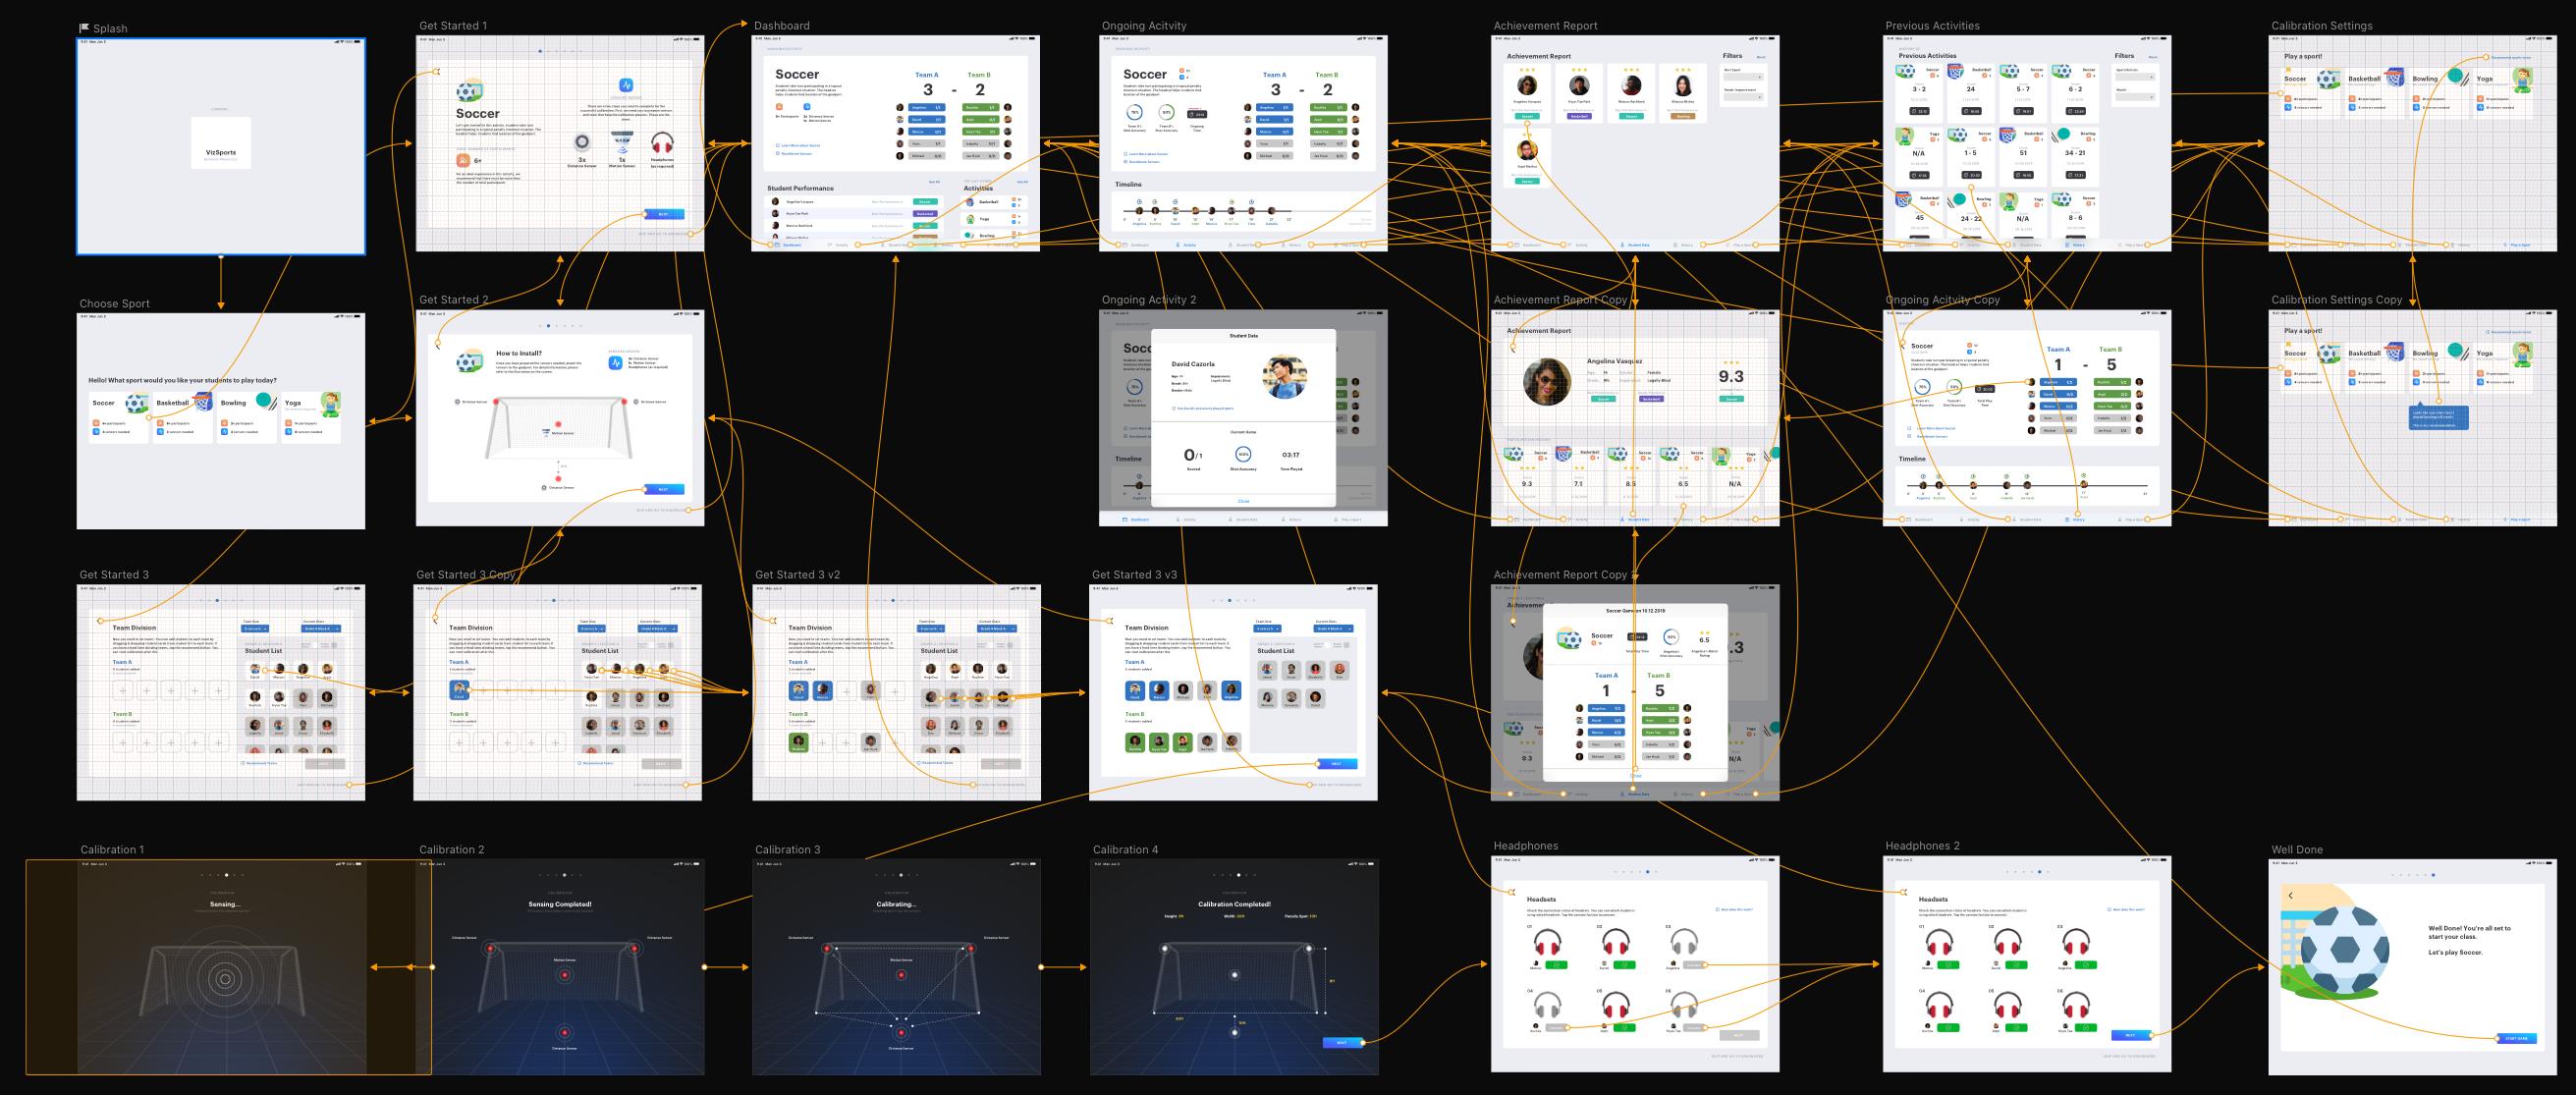 Screenshot 2020-01-04 14.54.57